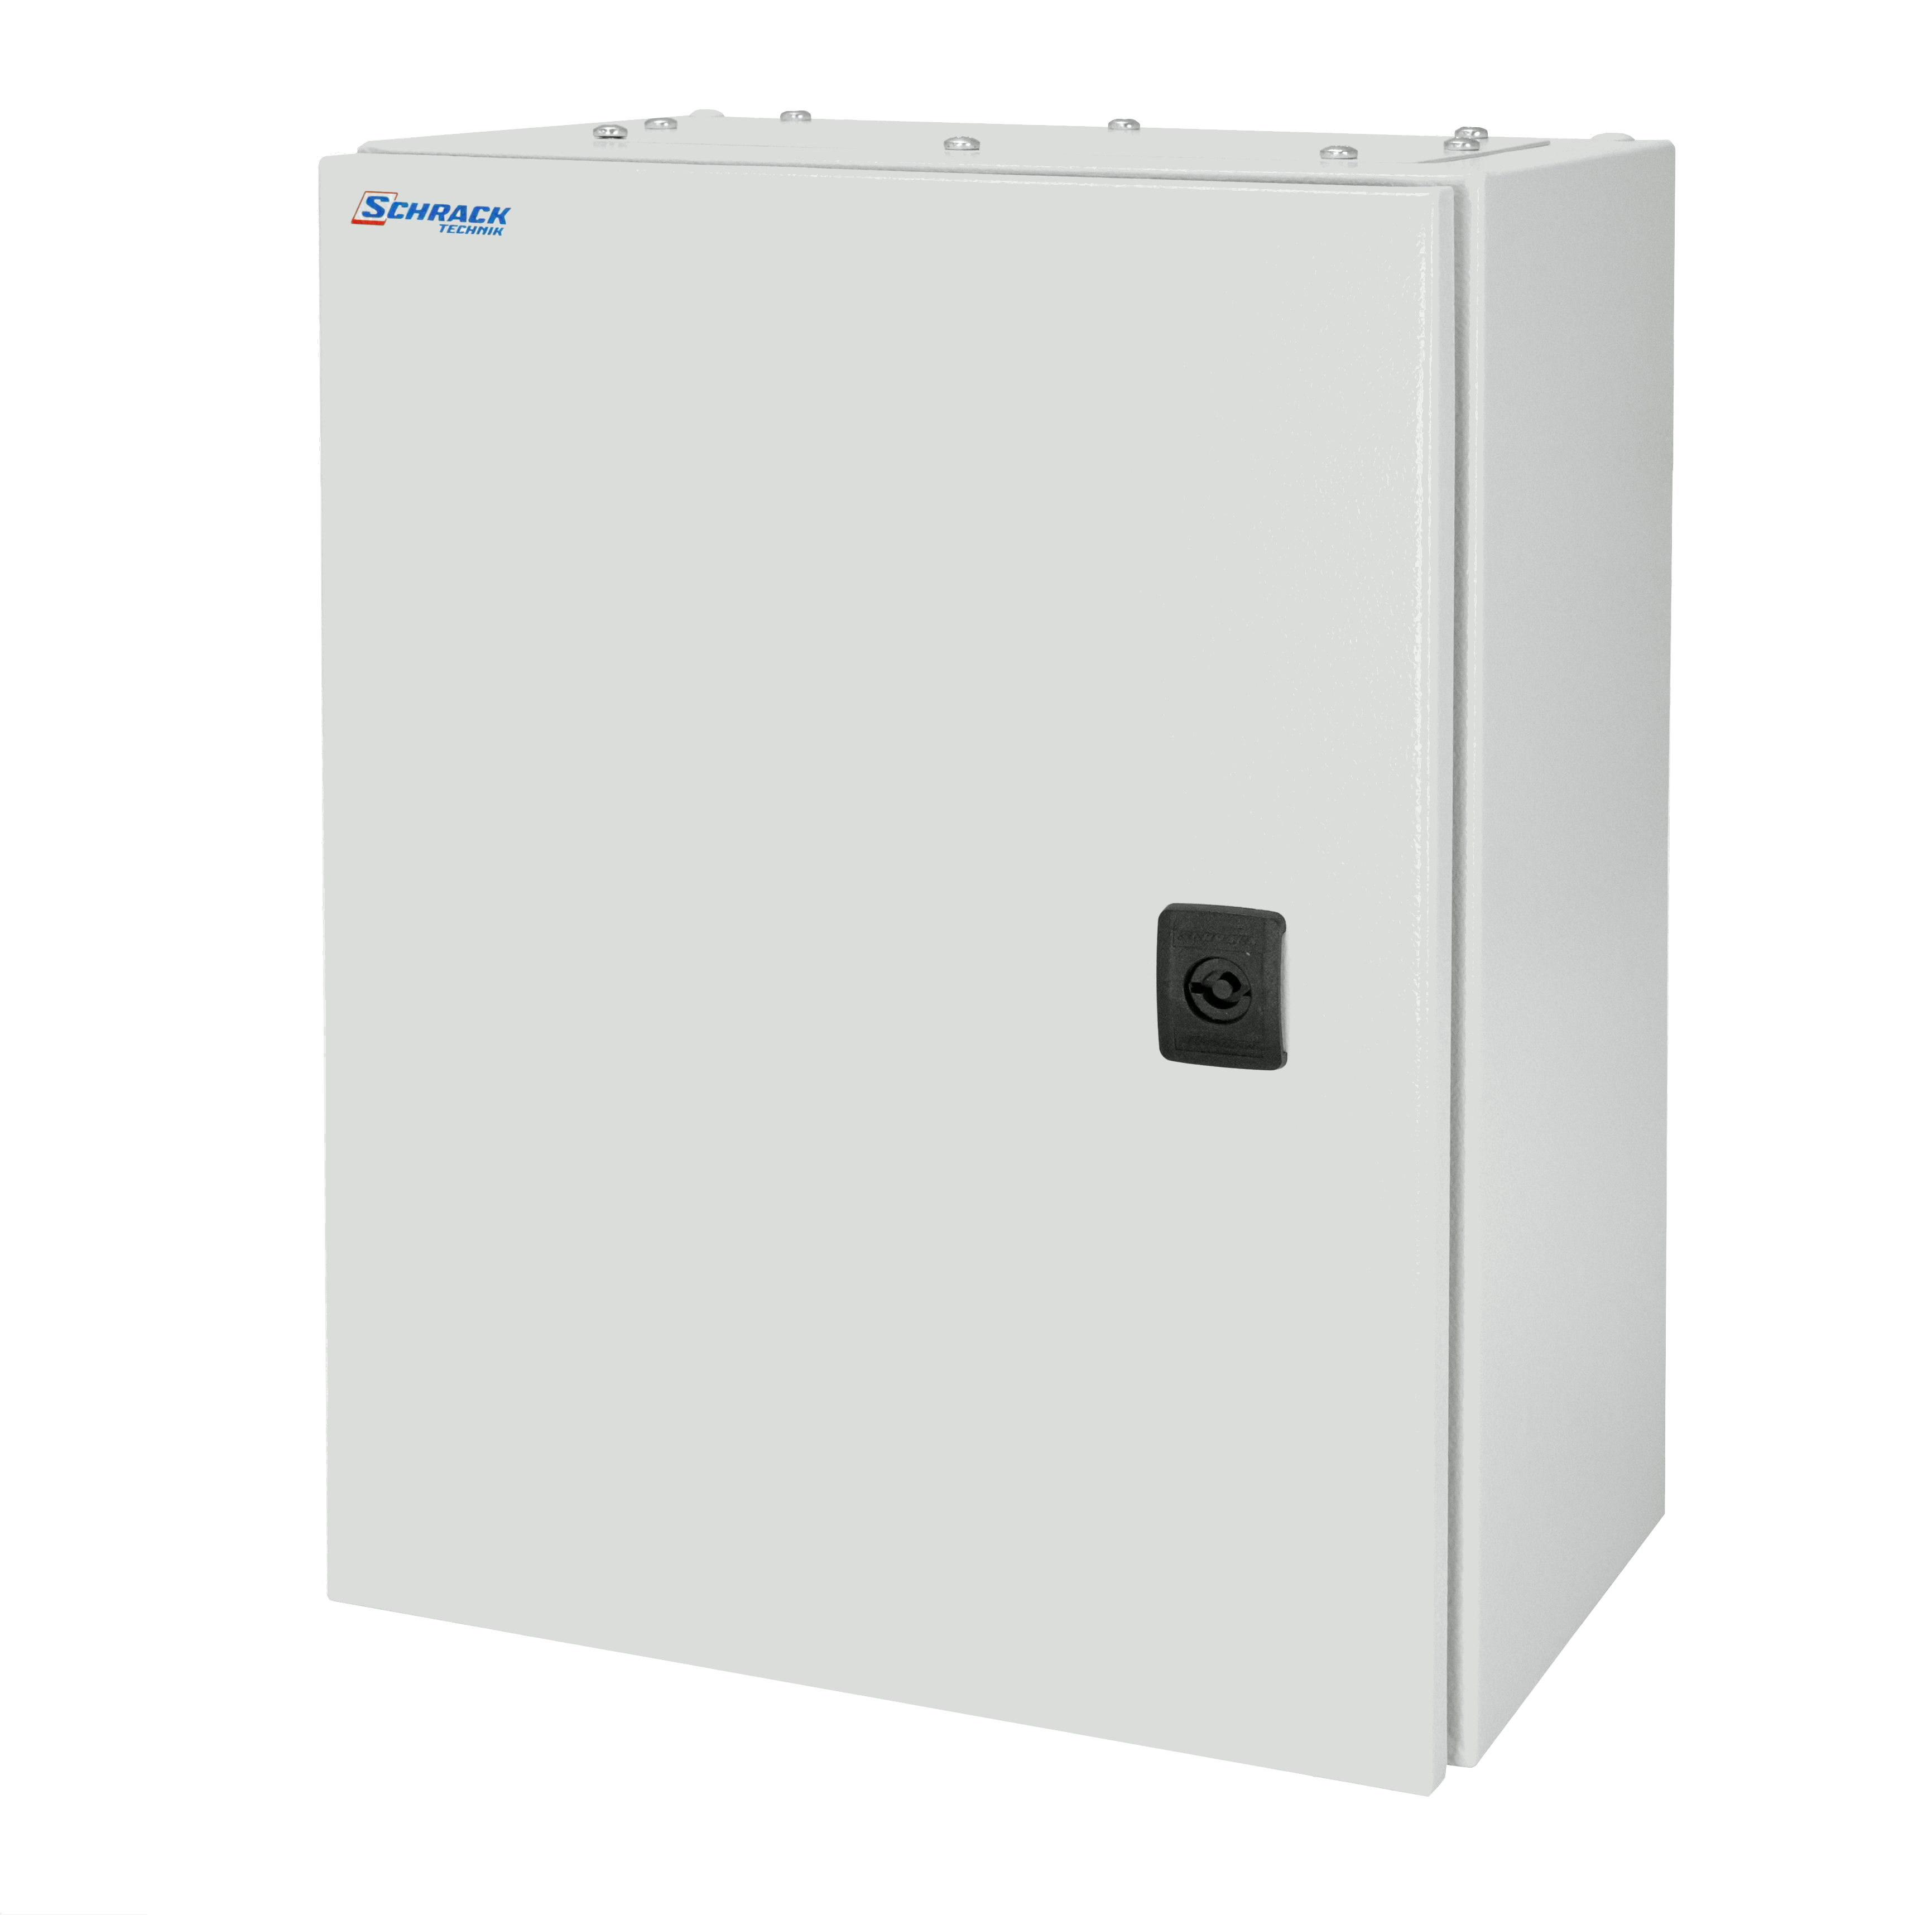 1 Stk Wandschrank Mono IP66 H=1200 B=800 T=300 Stahlblech WSM1208300